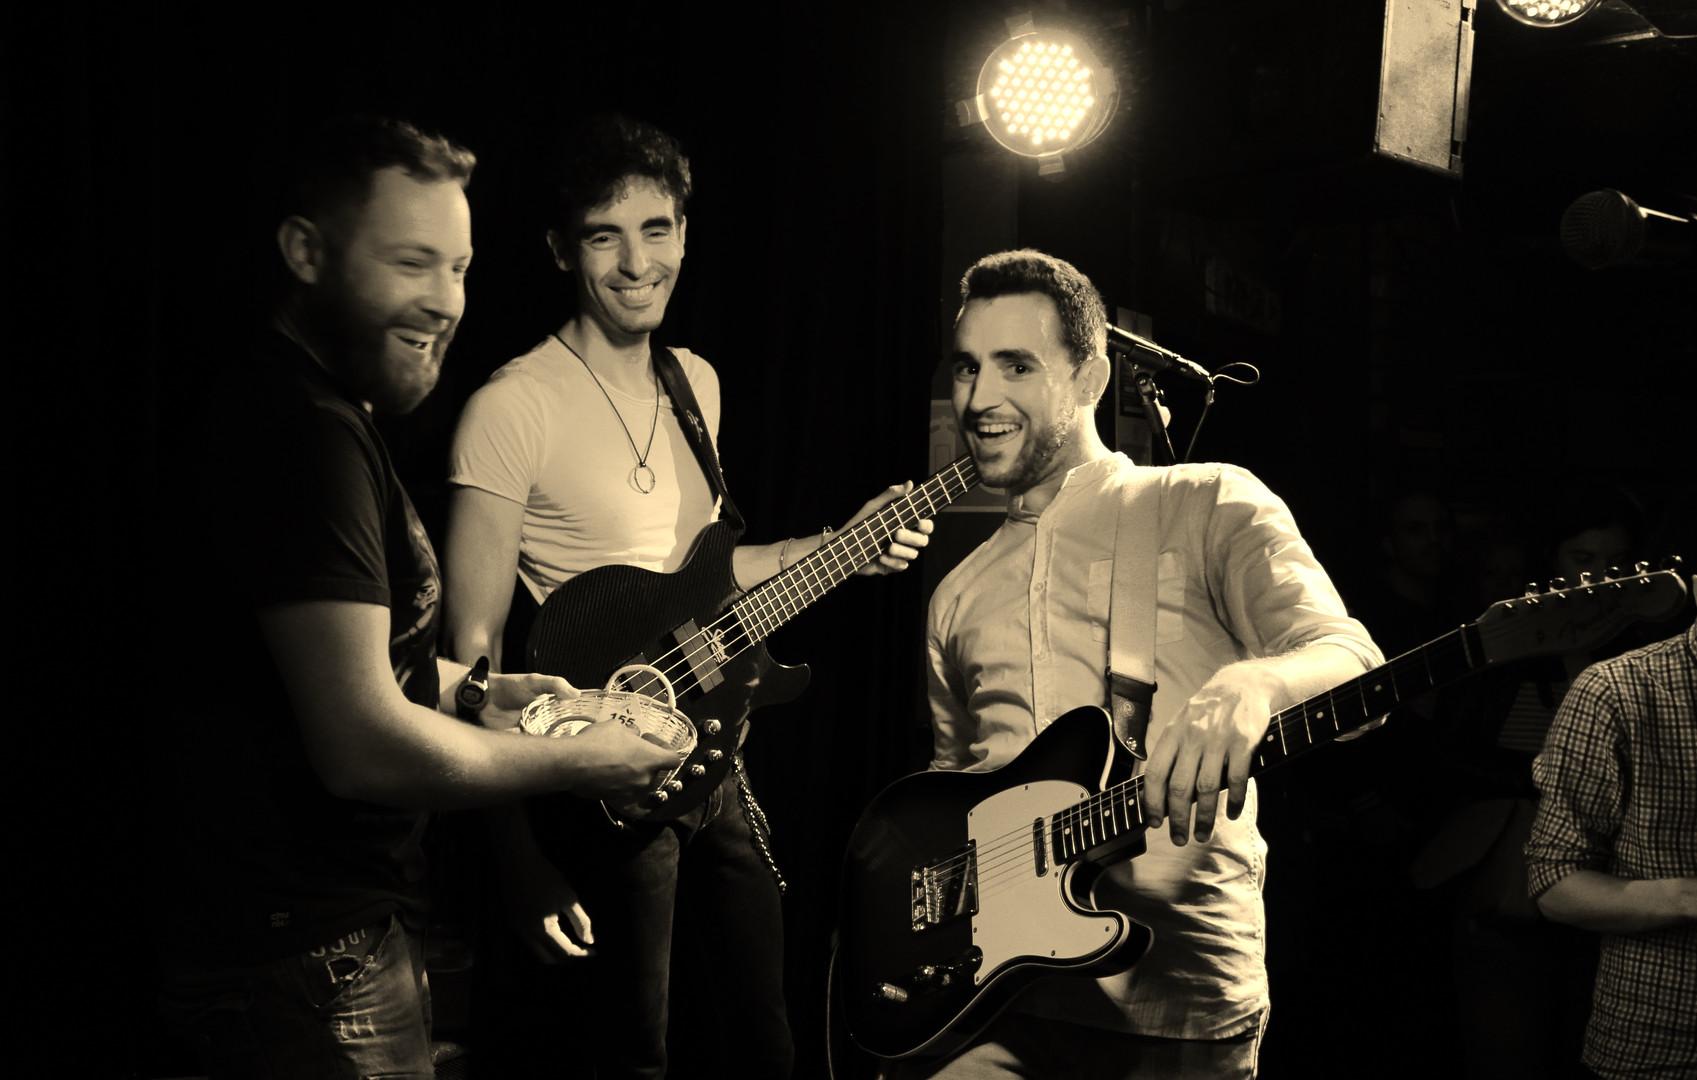 Ireland - Live band night